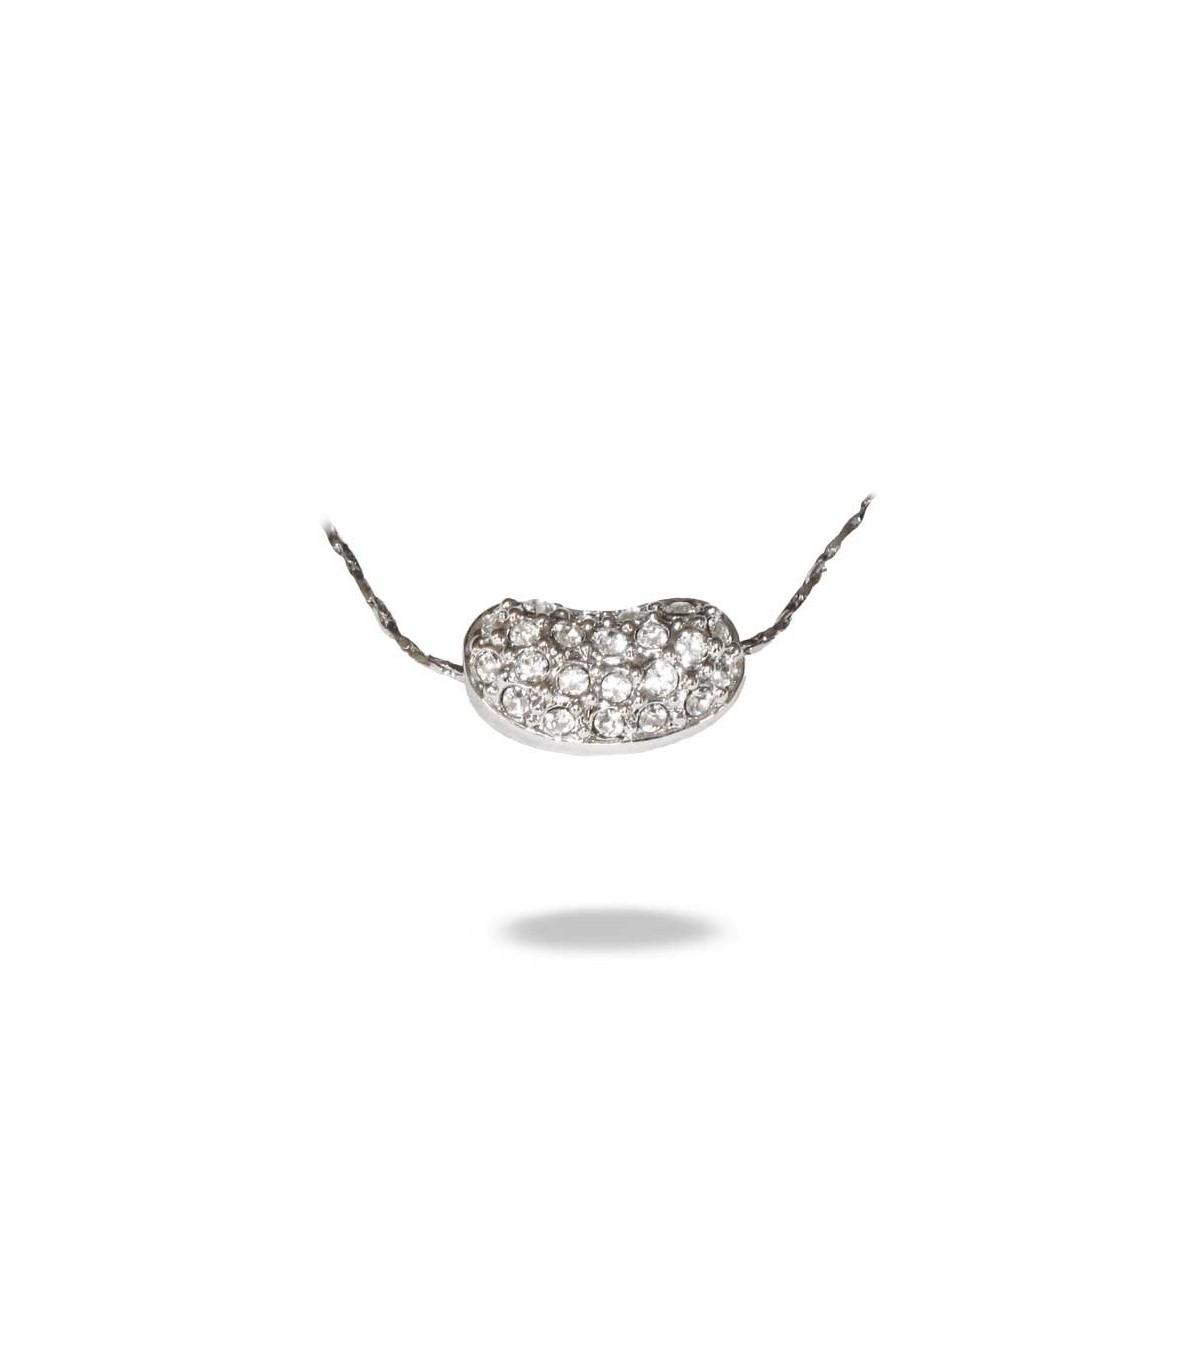 گردنبد لوبیای الماس